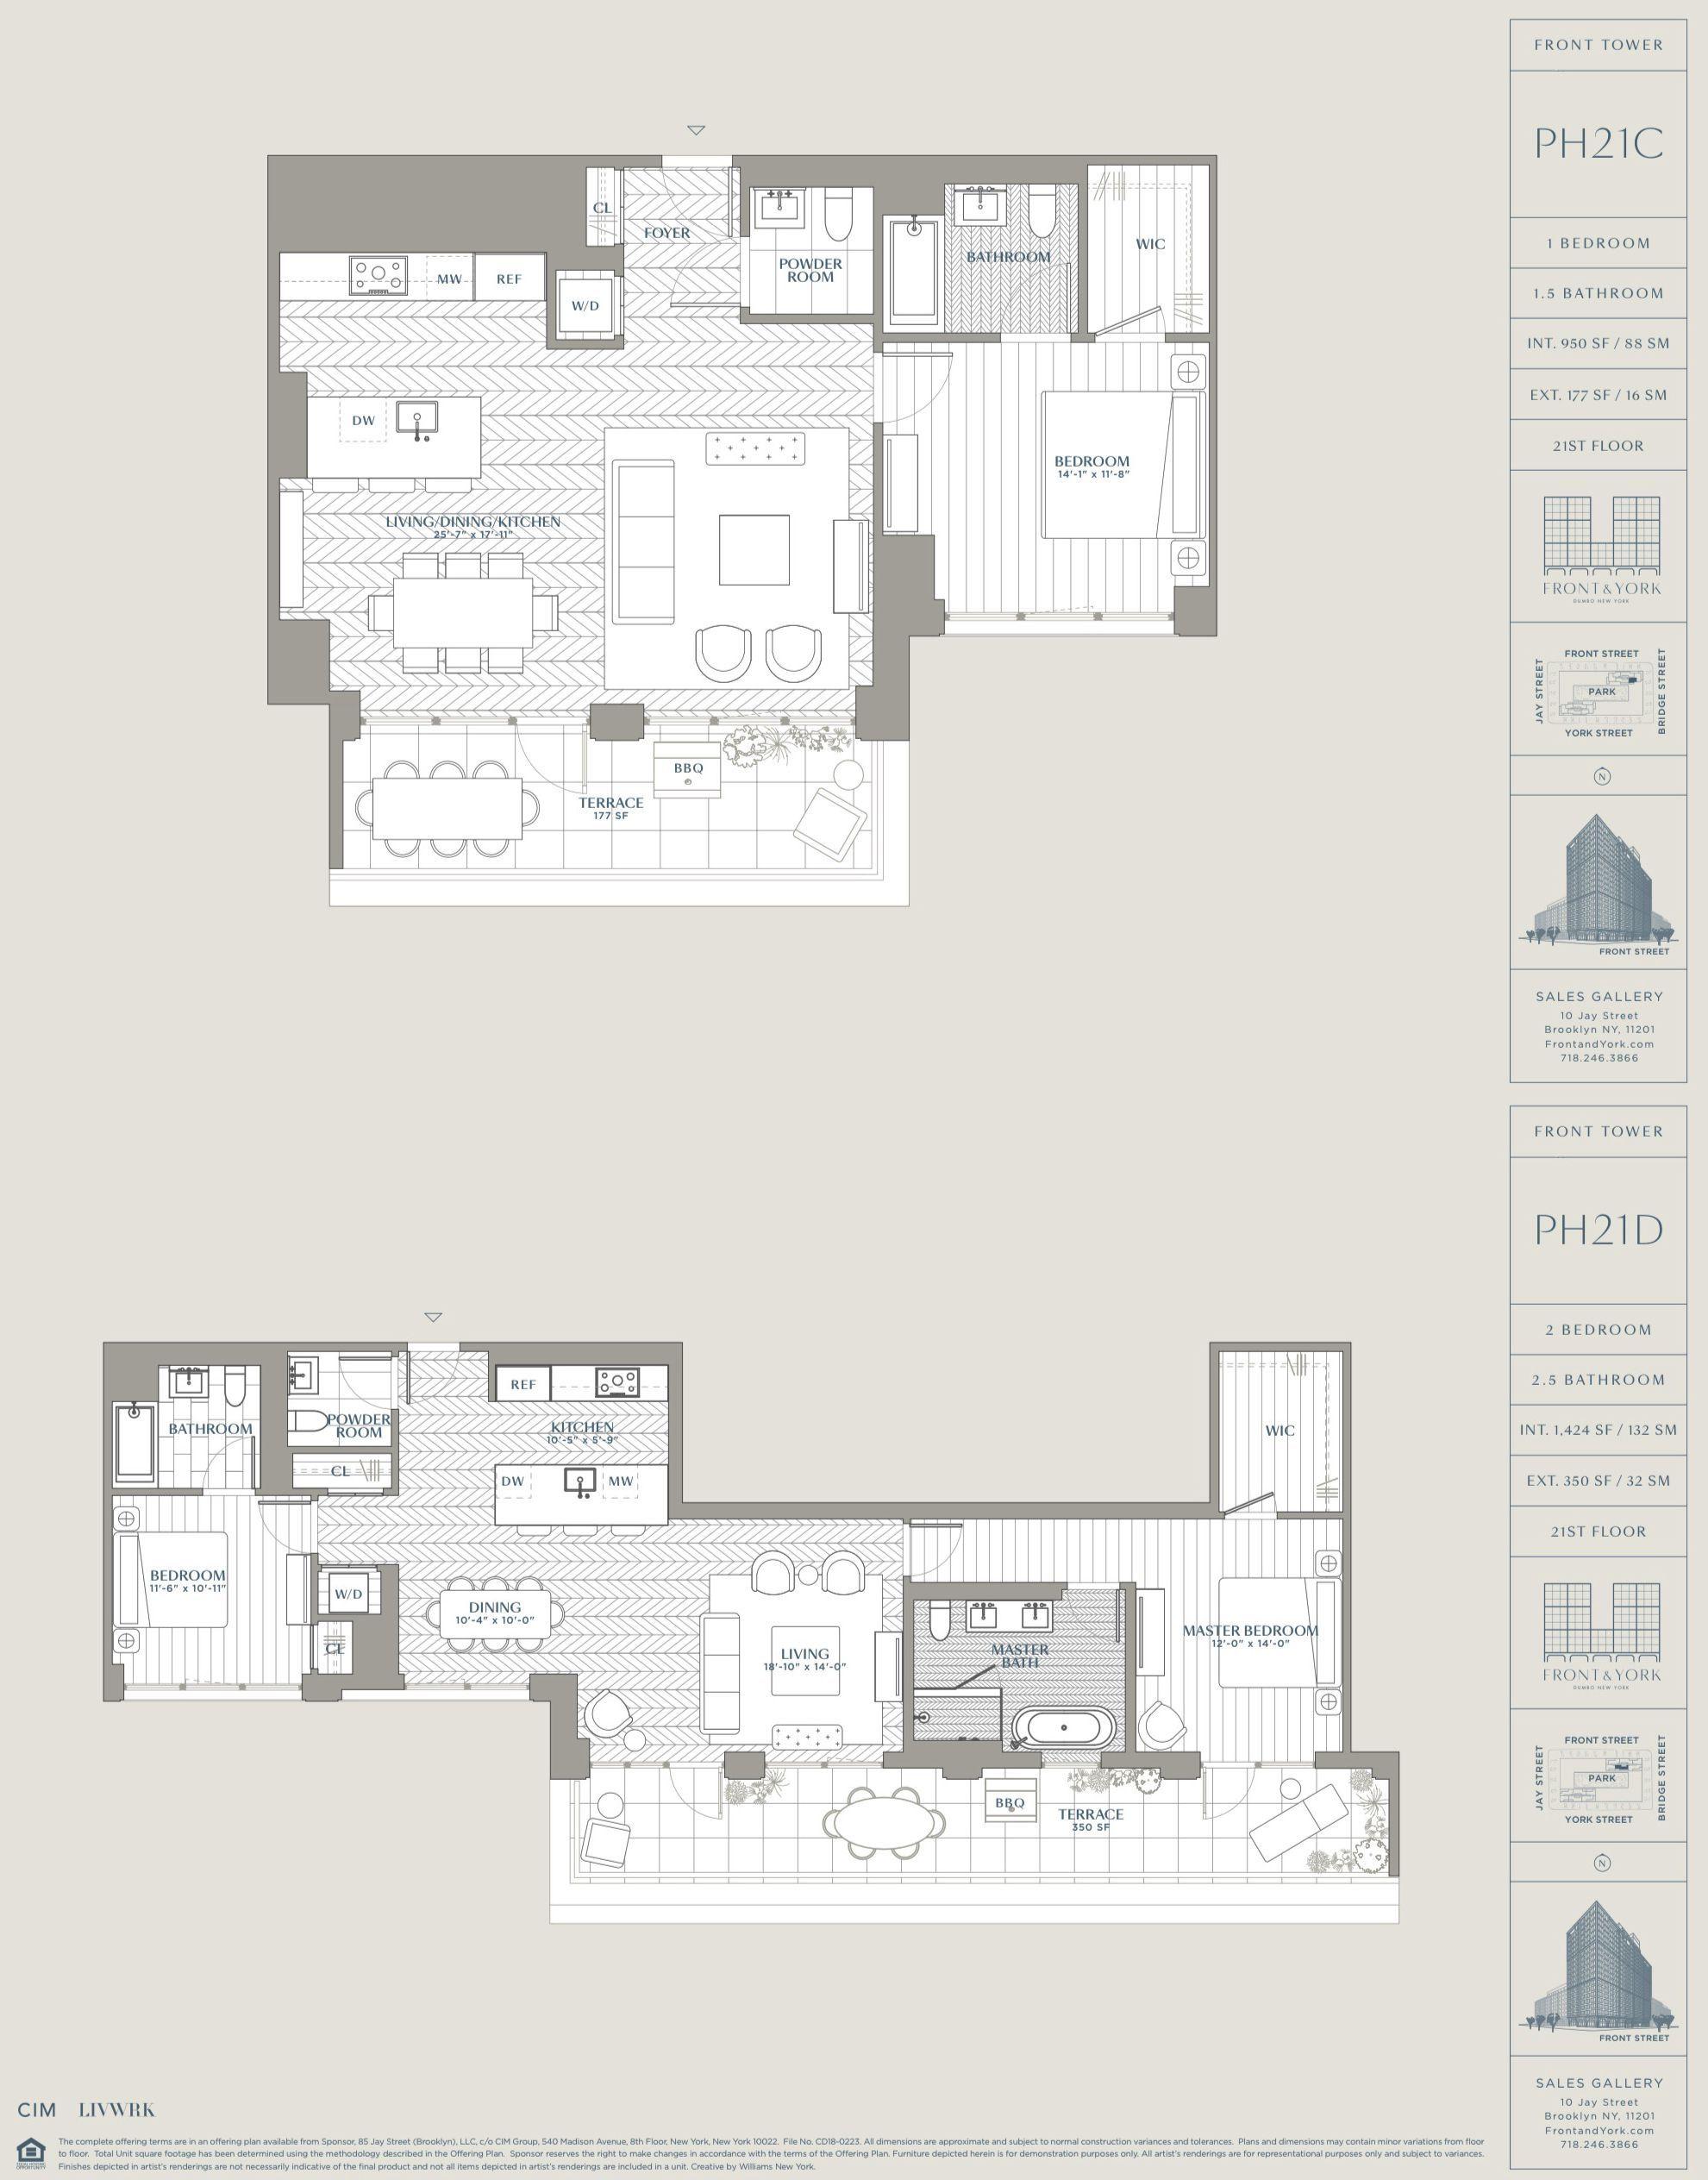 Front York Dumbo New York 85 Jay St Ph21 C D In 2020 Penthouse Apartment Floor Plan Floor Plans New Condo